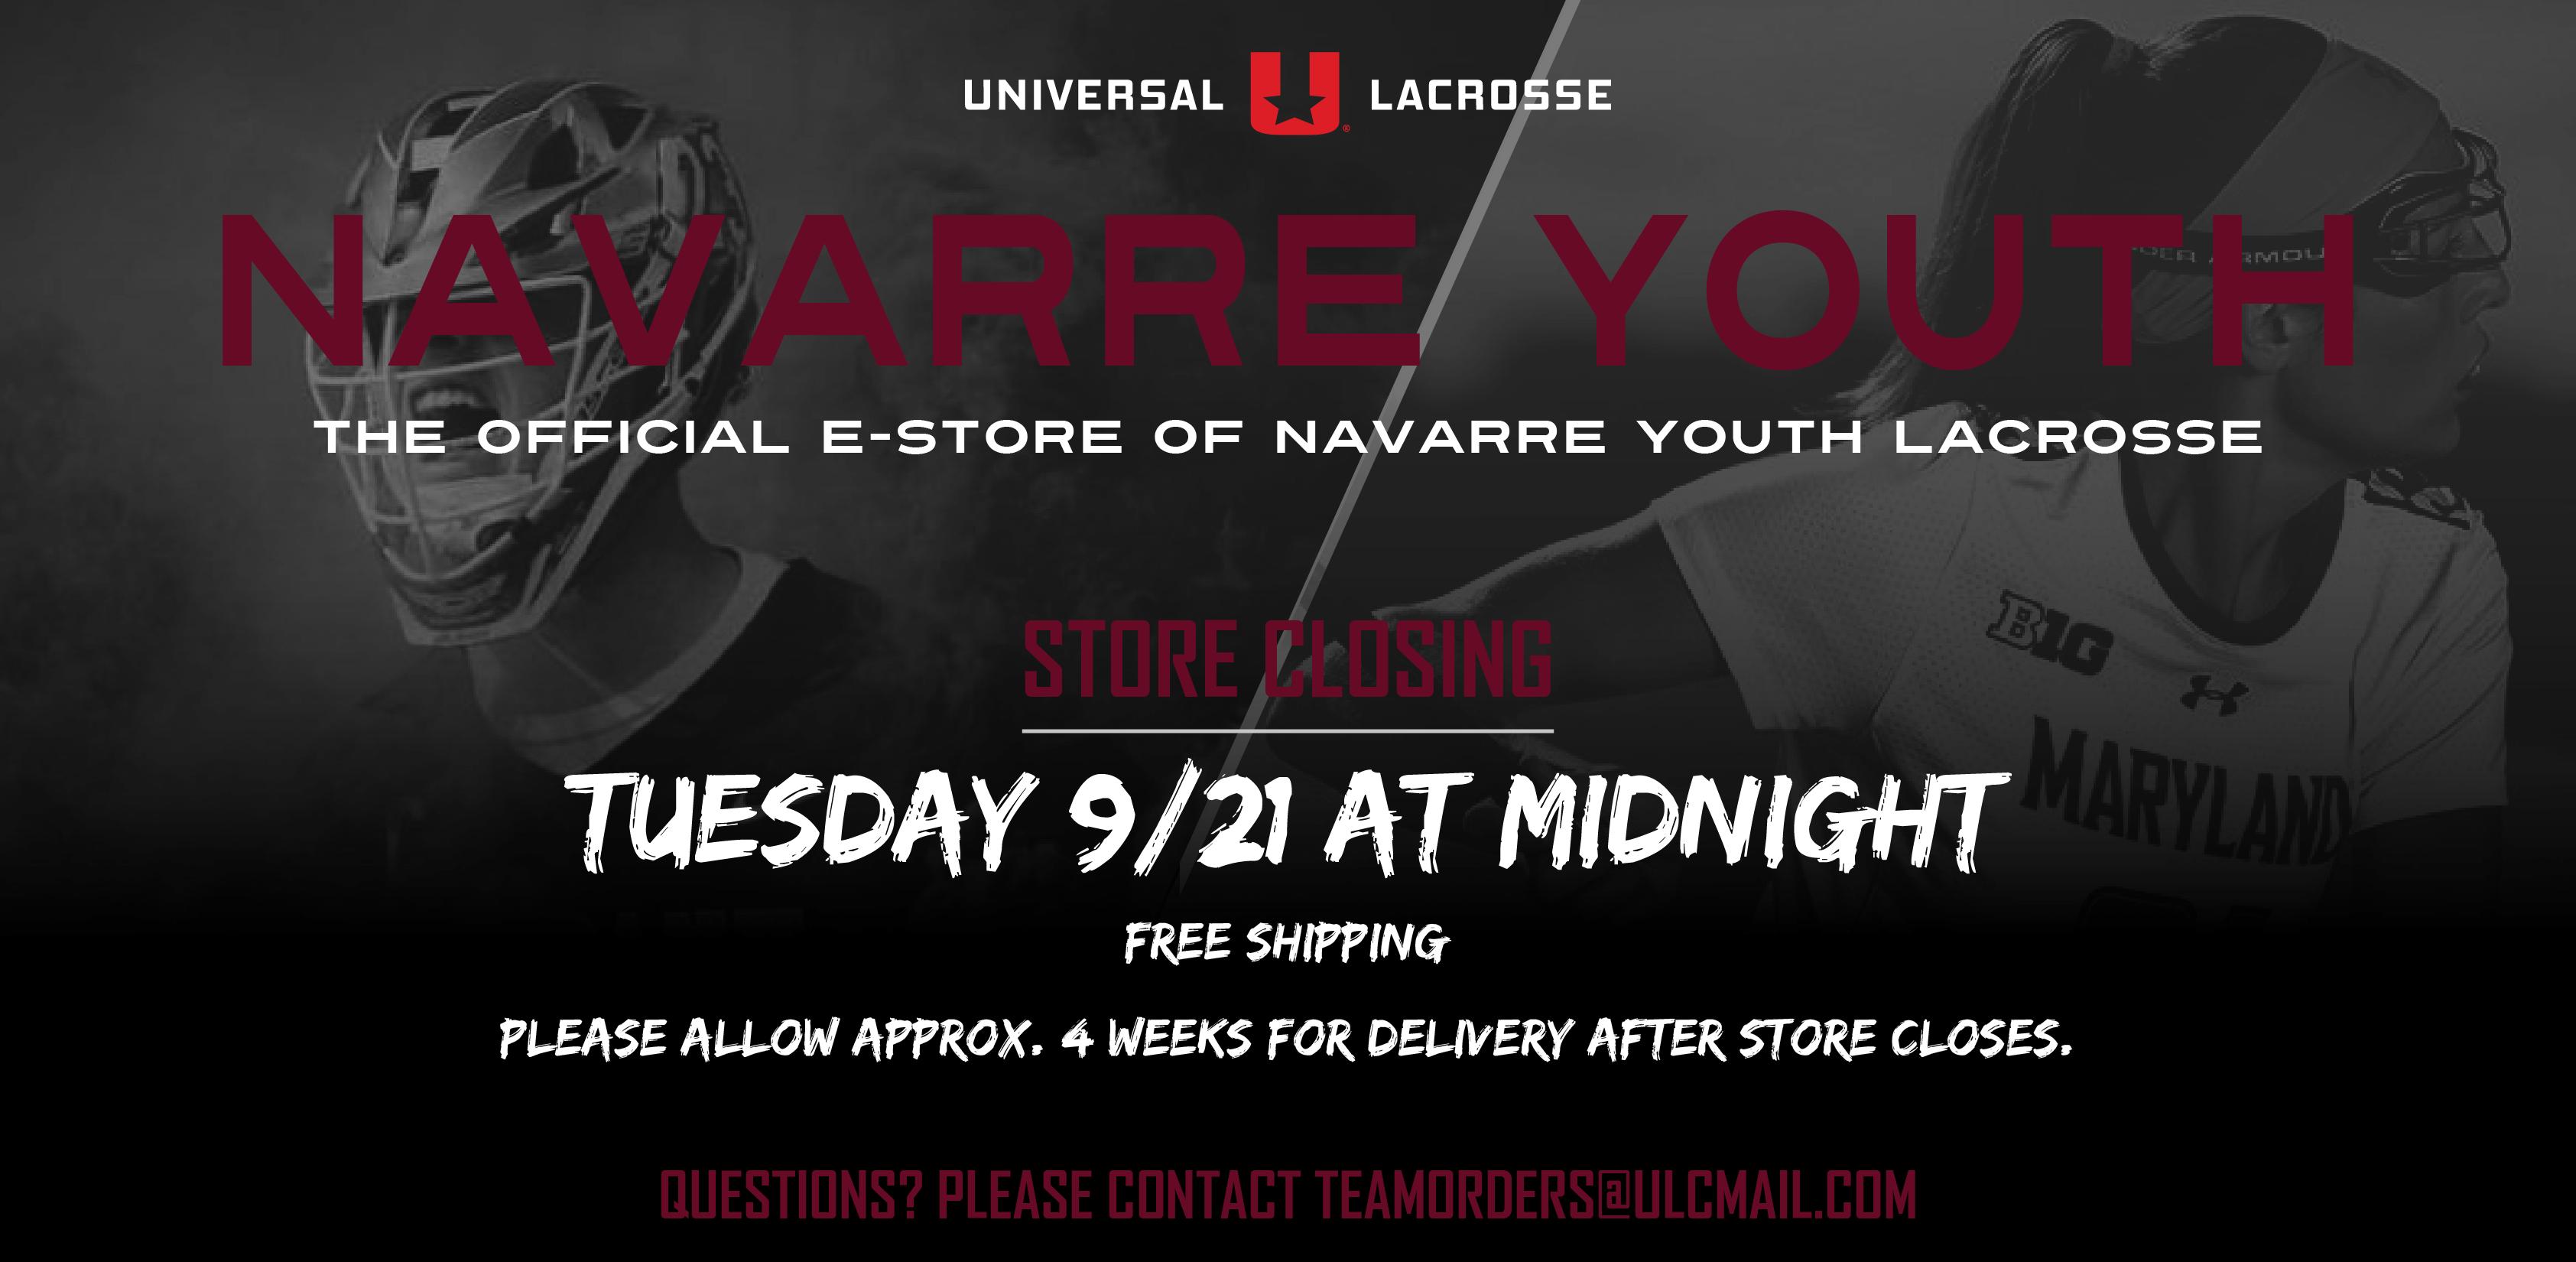 Navarre Youth Lacrosse